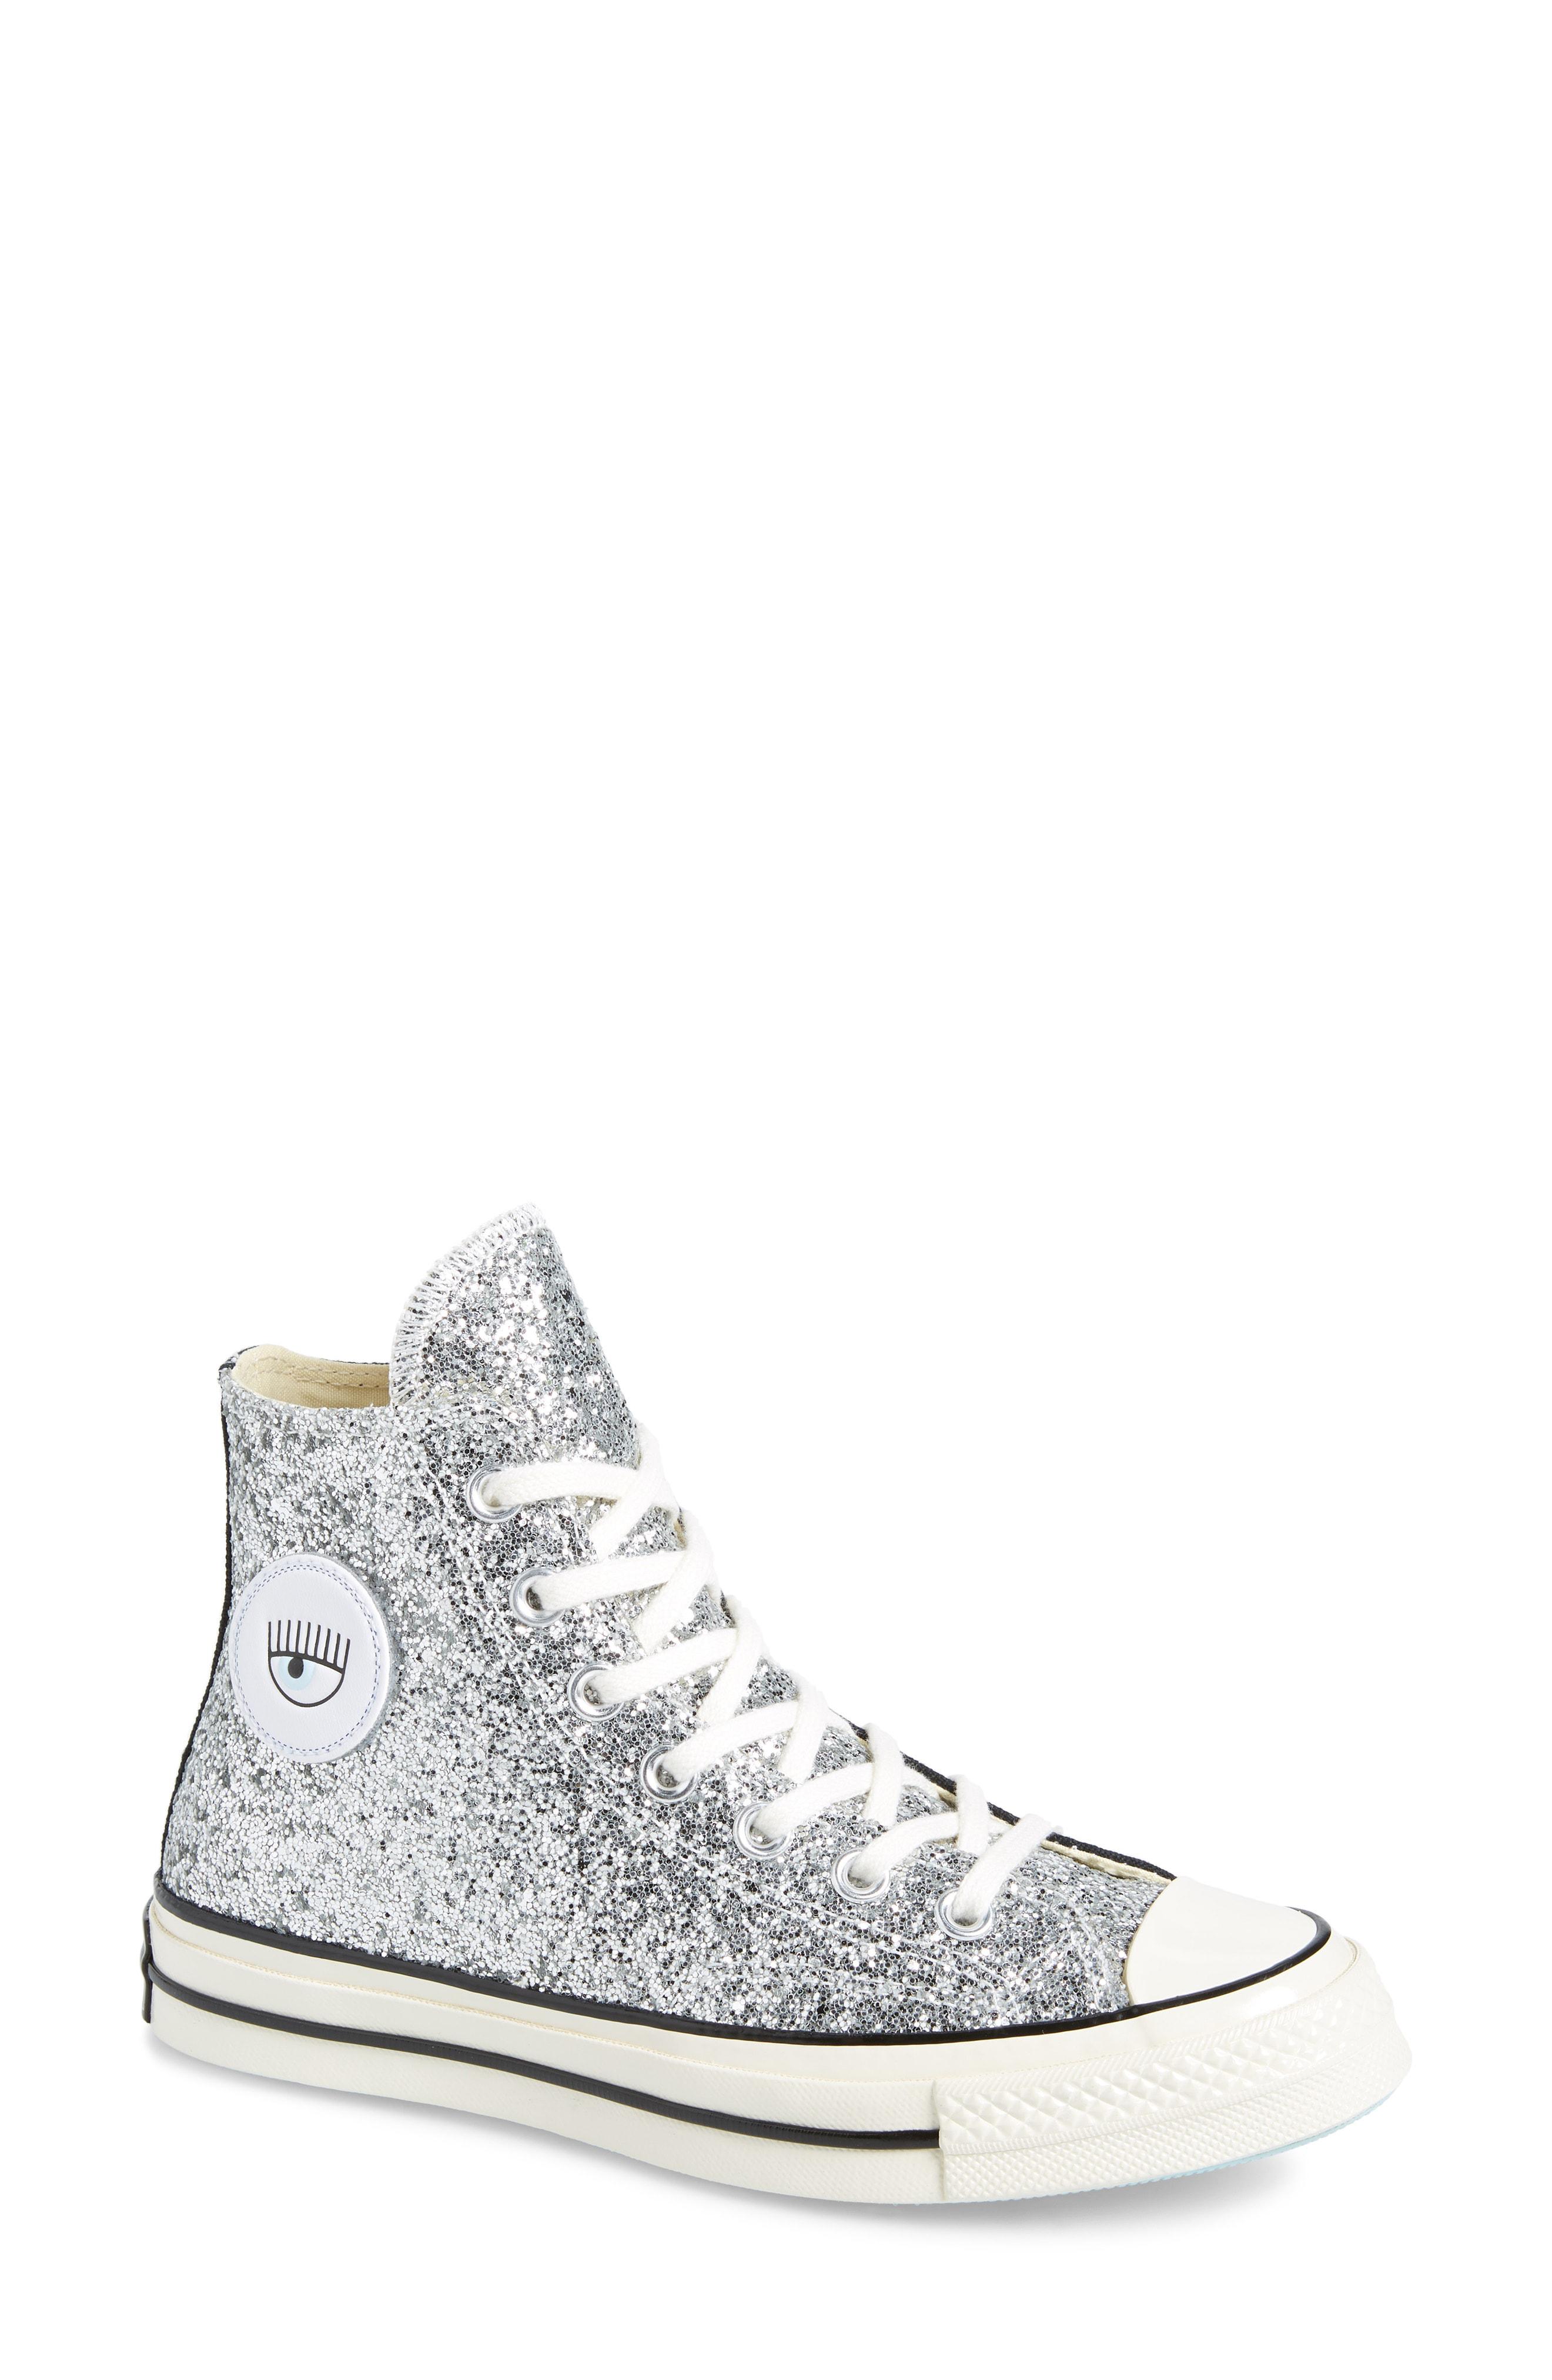 21ef8bfcf62c Converse X Chiara Ferragni Women s Chuck Taylor Tillands Glitter High Top  Sneakers In Black  Metallic